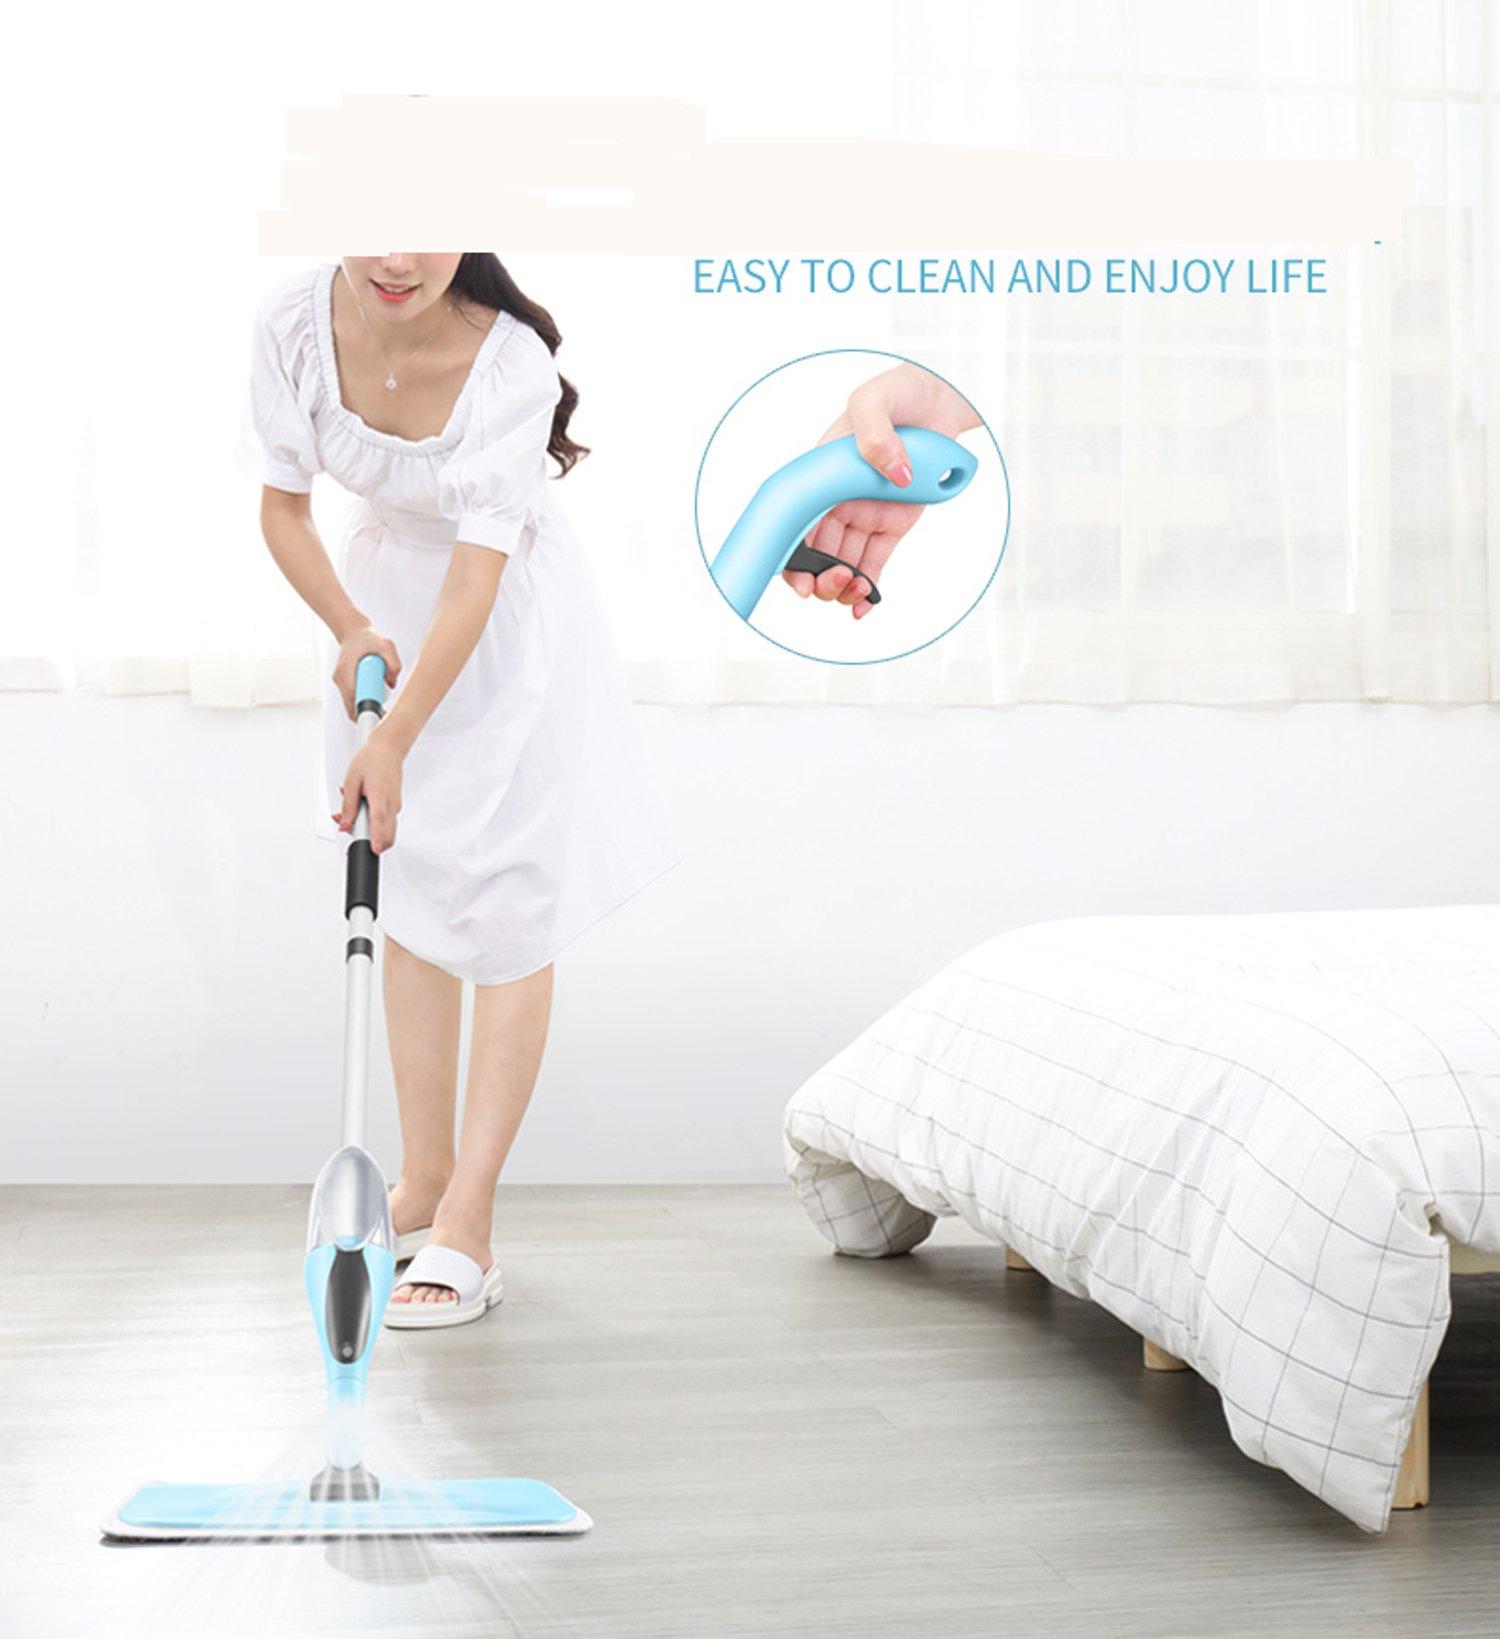 FreedomDesign Microfiber Hardwood Floor Spray Mop 360 Degree Professional Spray Mop for House Kitchen Hardwood Ceramic Floor Includes: Reusable Microfiber Pads (Blue) by FreedomDesign (Image #2)